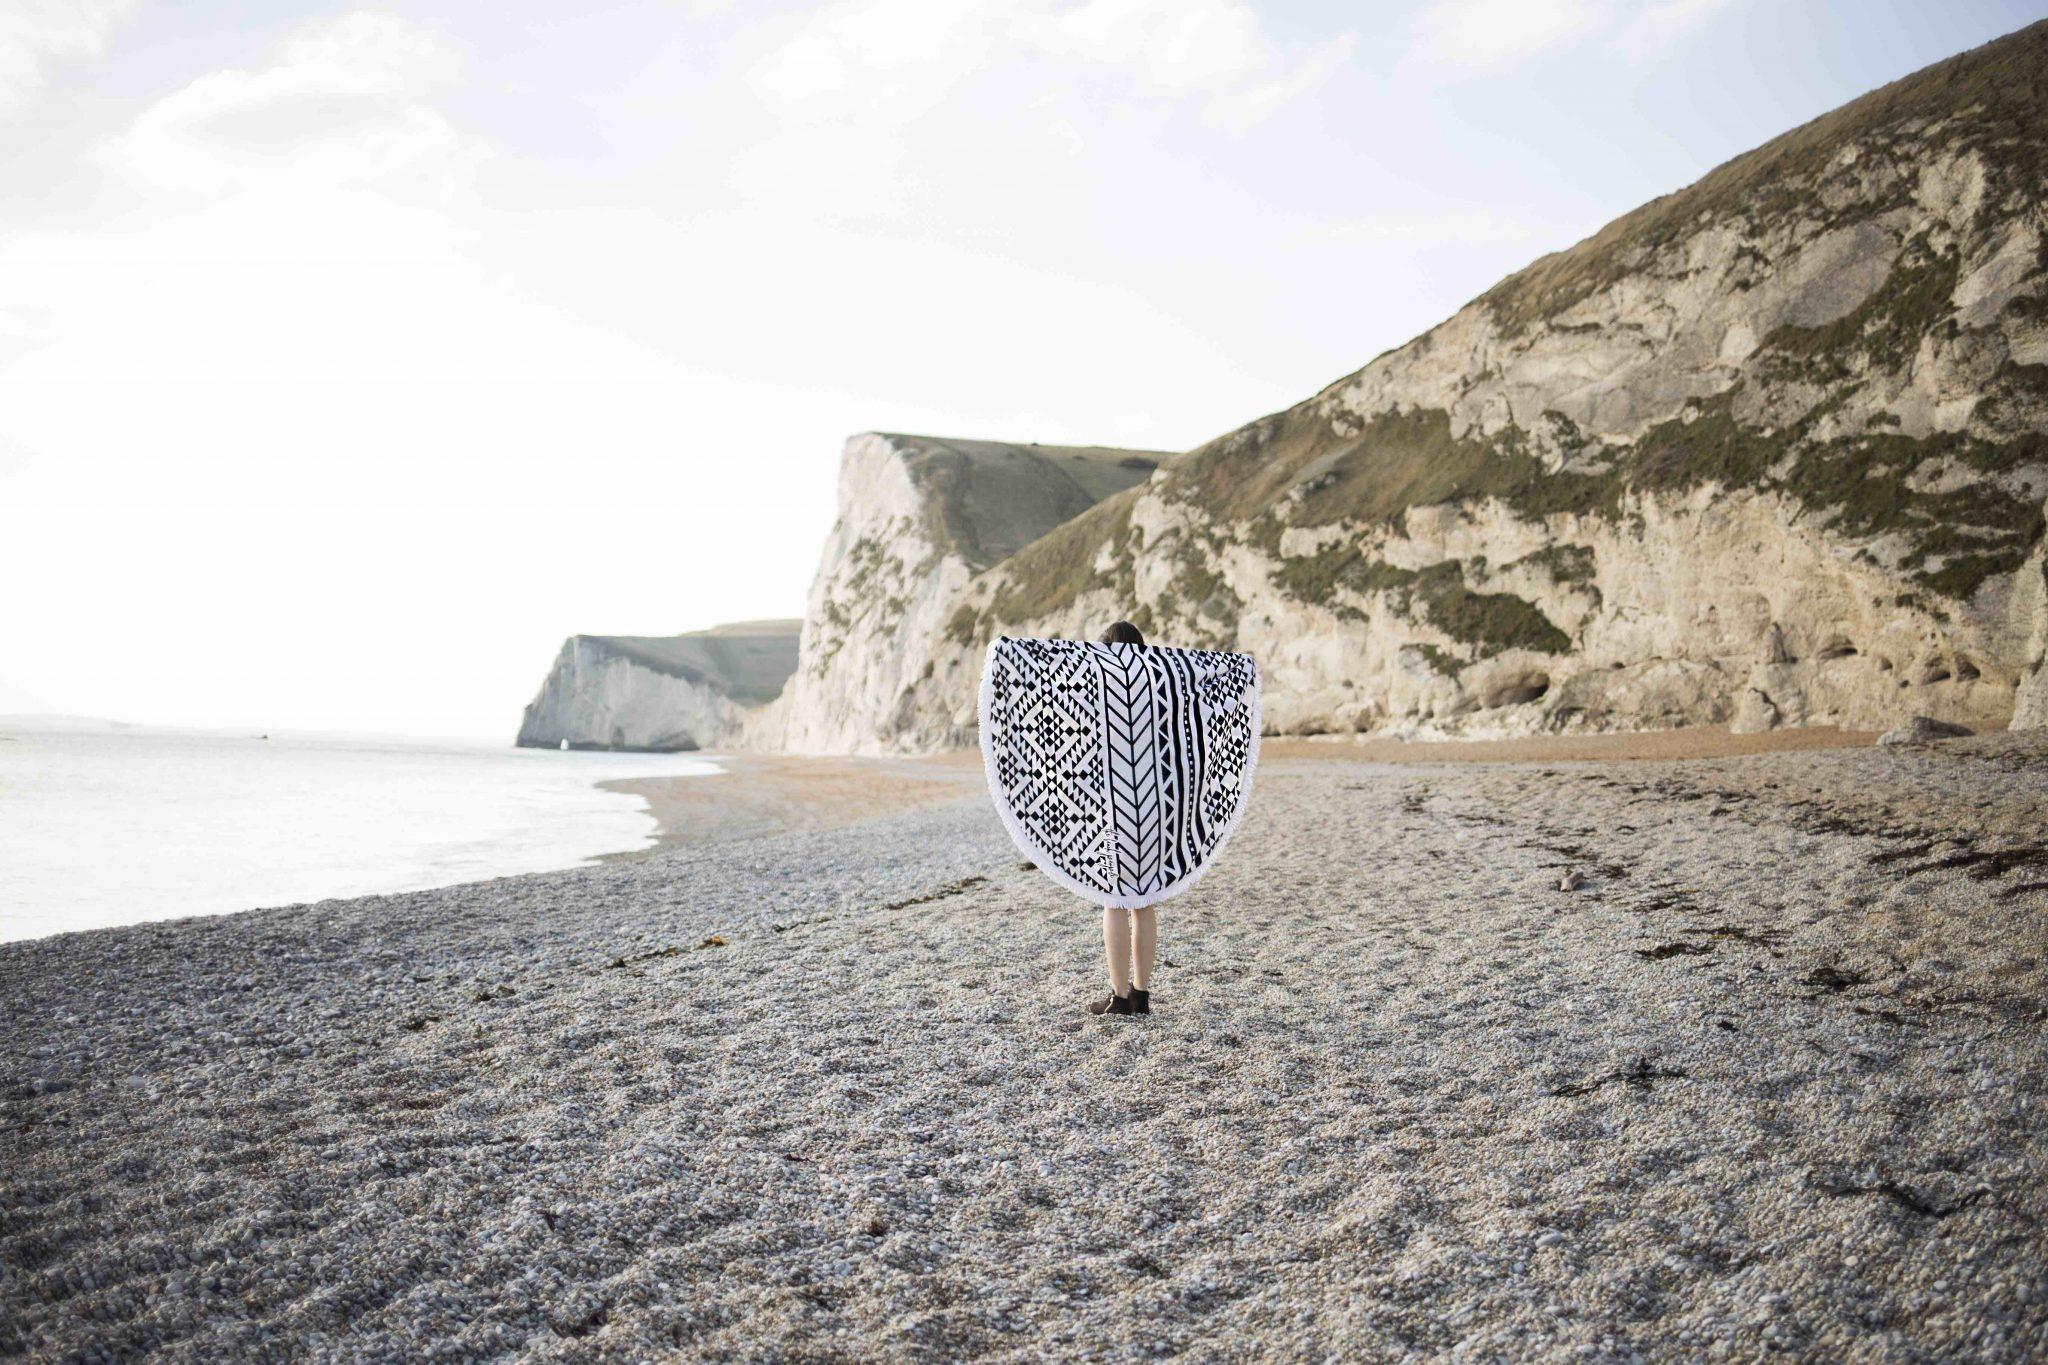 Jordan_Bunker_the_beach_people_10 copy